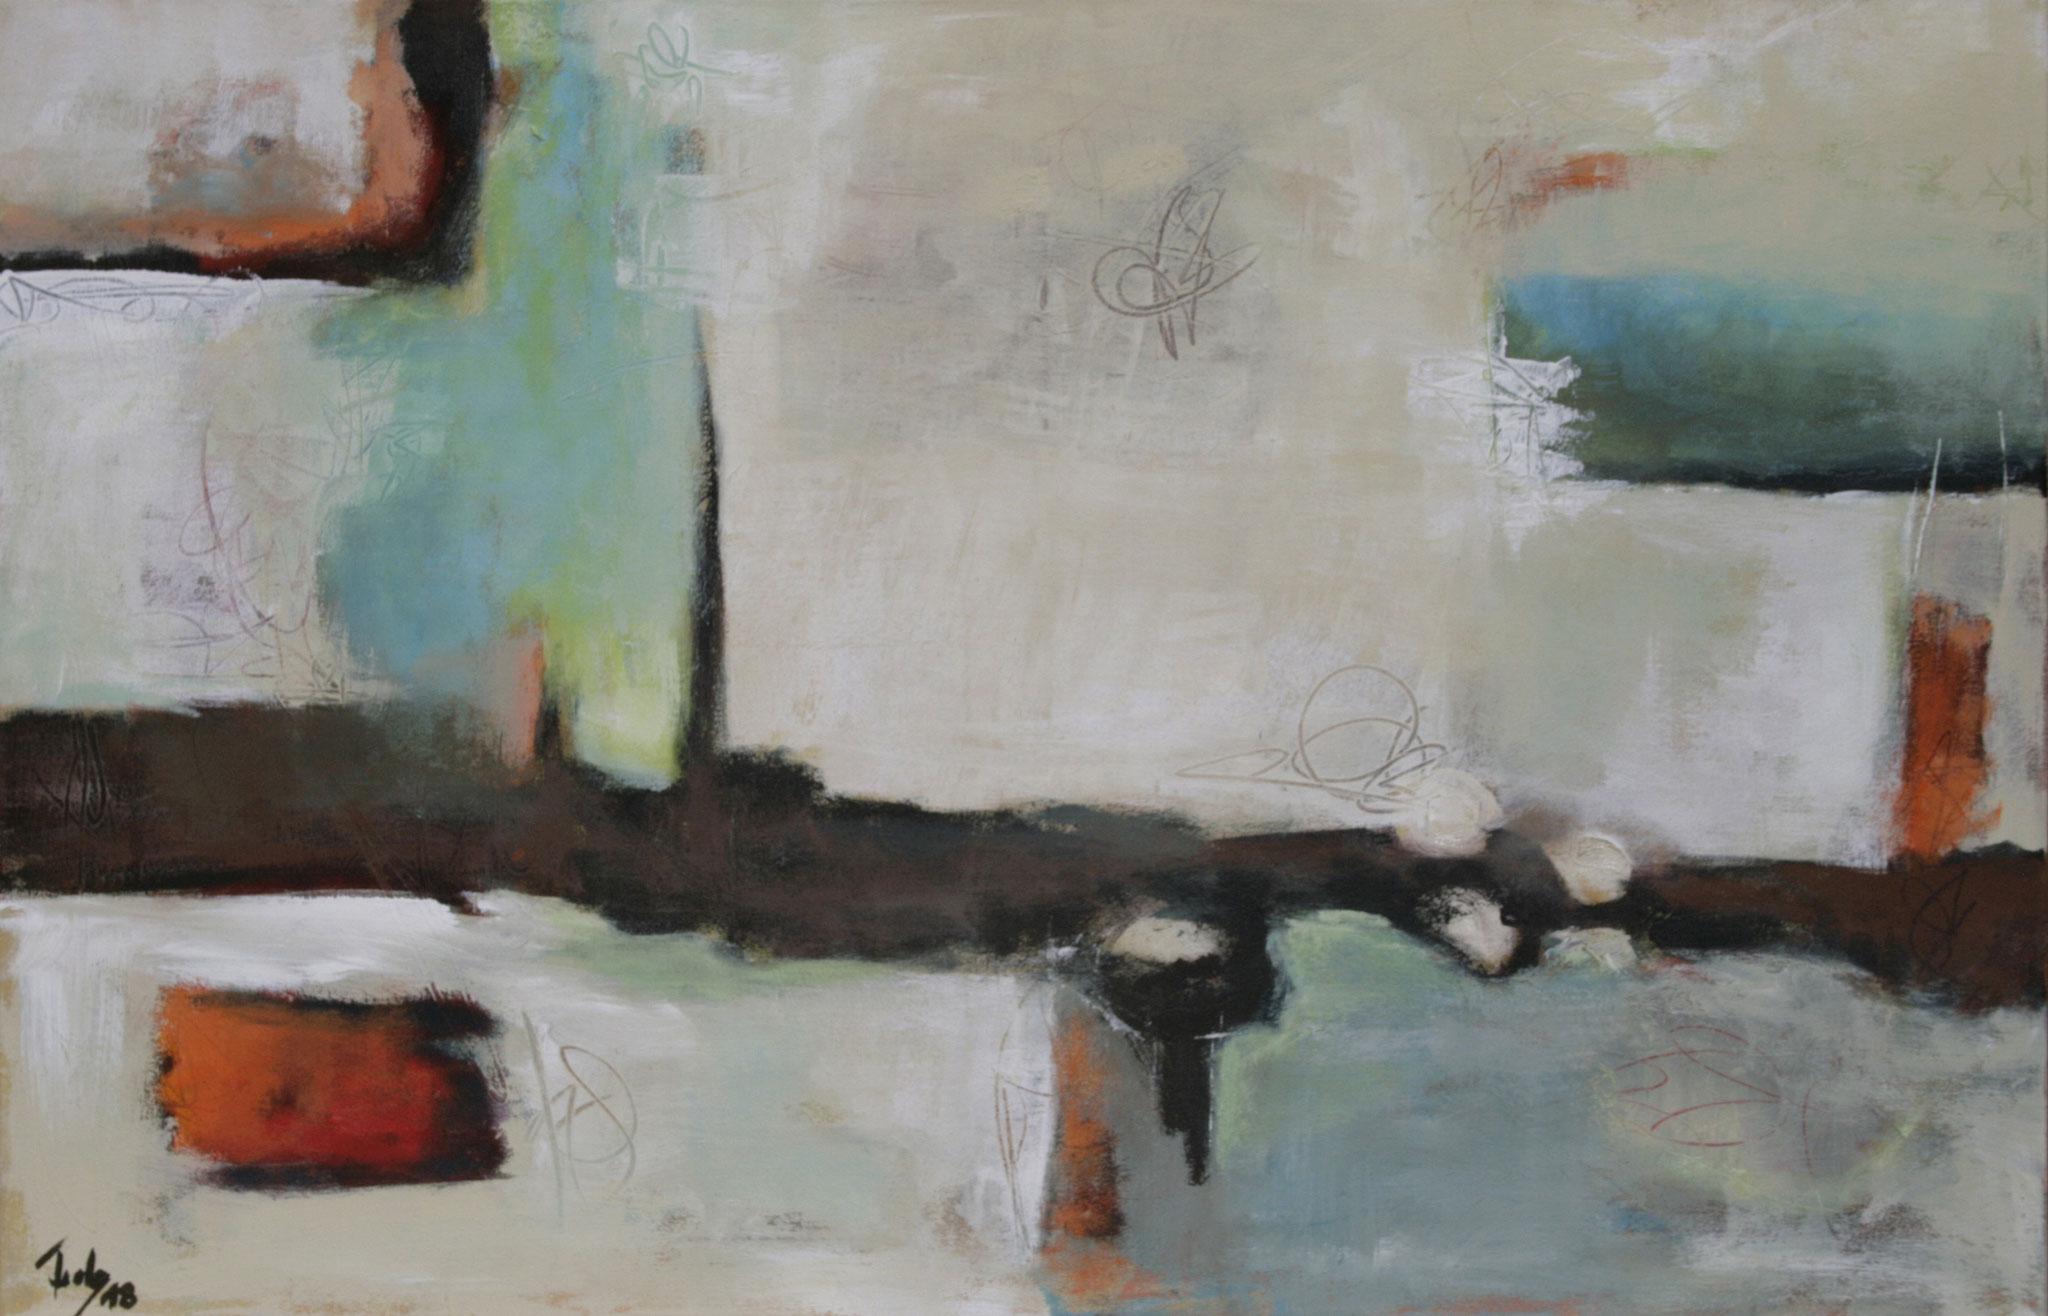 Ohne Titel 1805, Öl und Acryl auf Leinwand, 65 x 90 cm